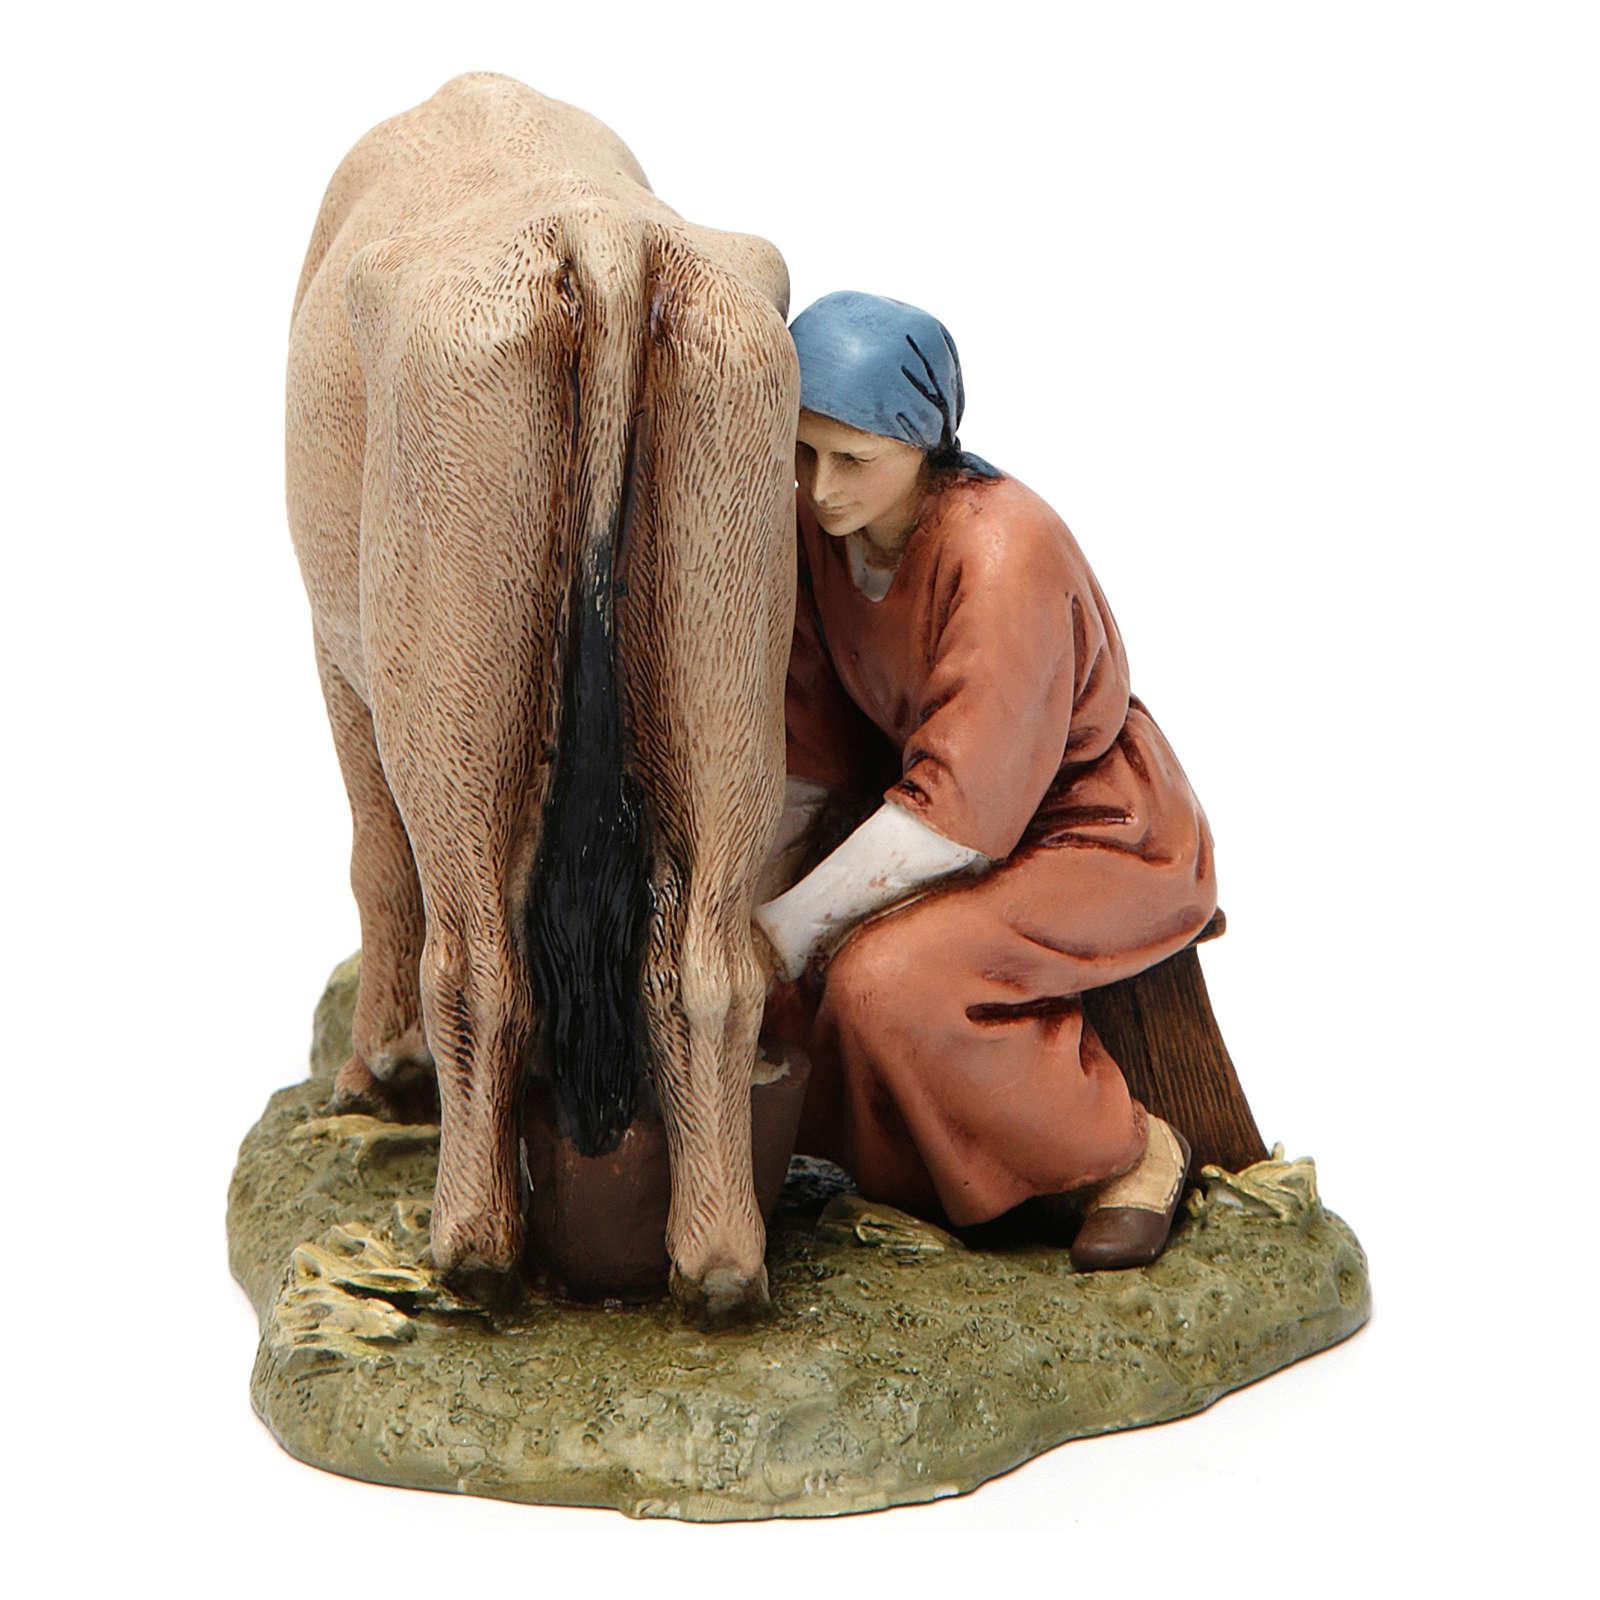 Mungitrice con mucca in resina 13 cm Moranduzzo 4